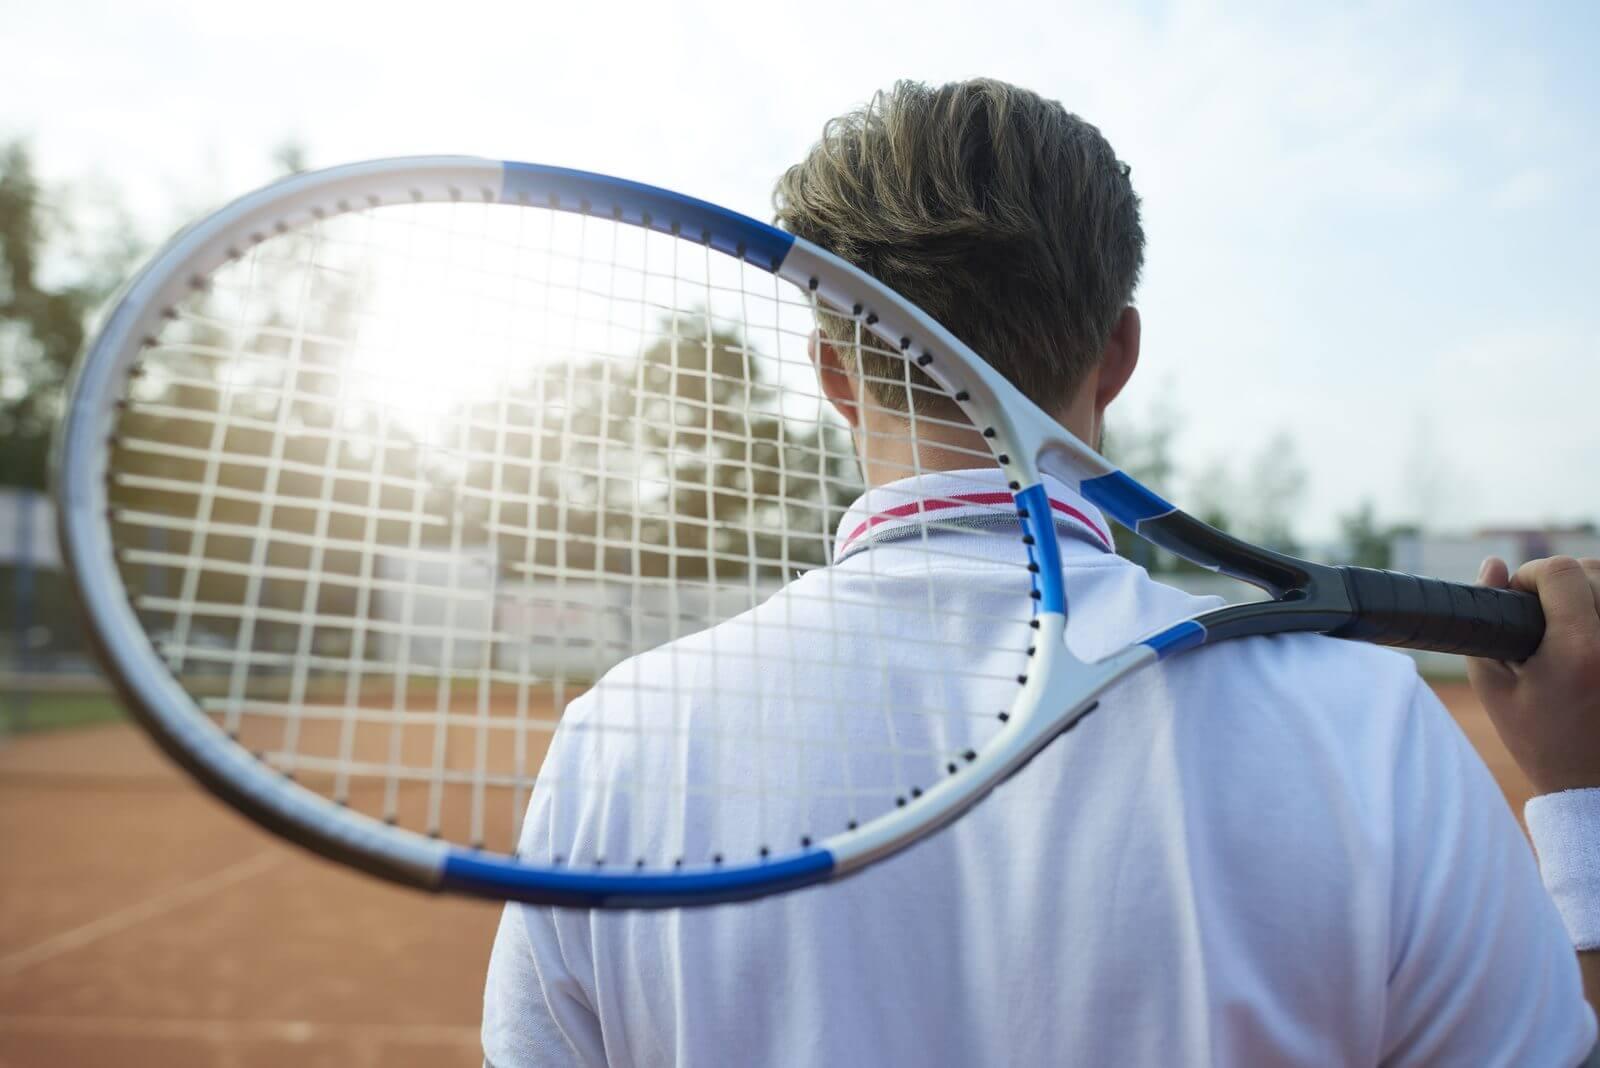 Storyblocks tennis